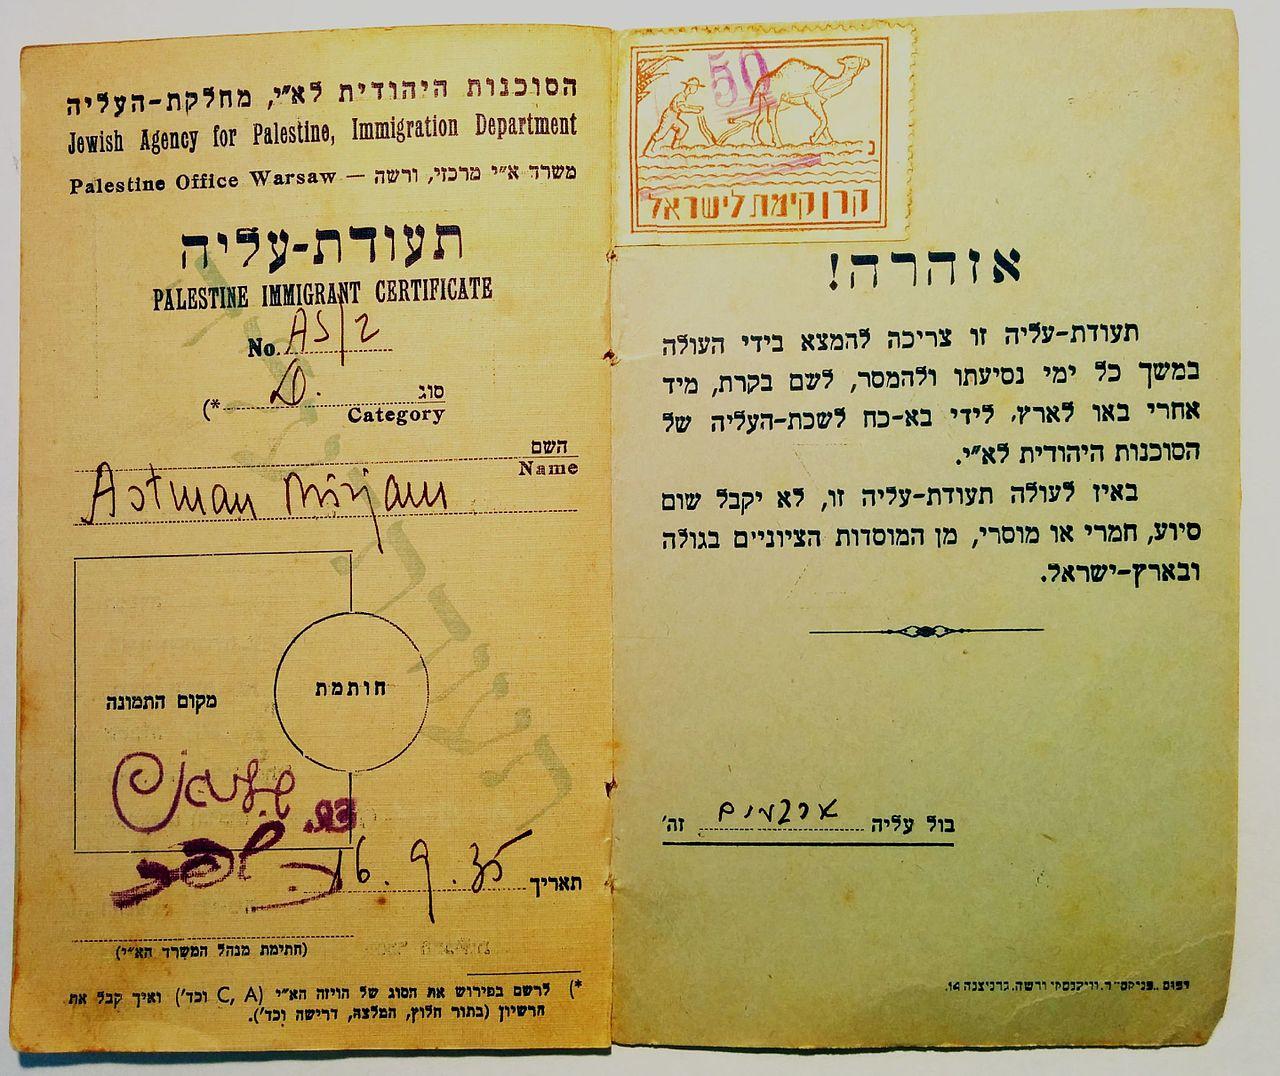 Palestine immigration certificate. Photo source: Wikimedia